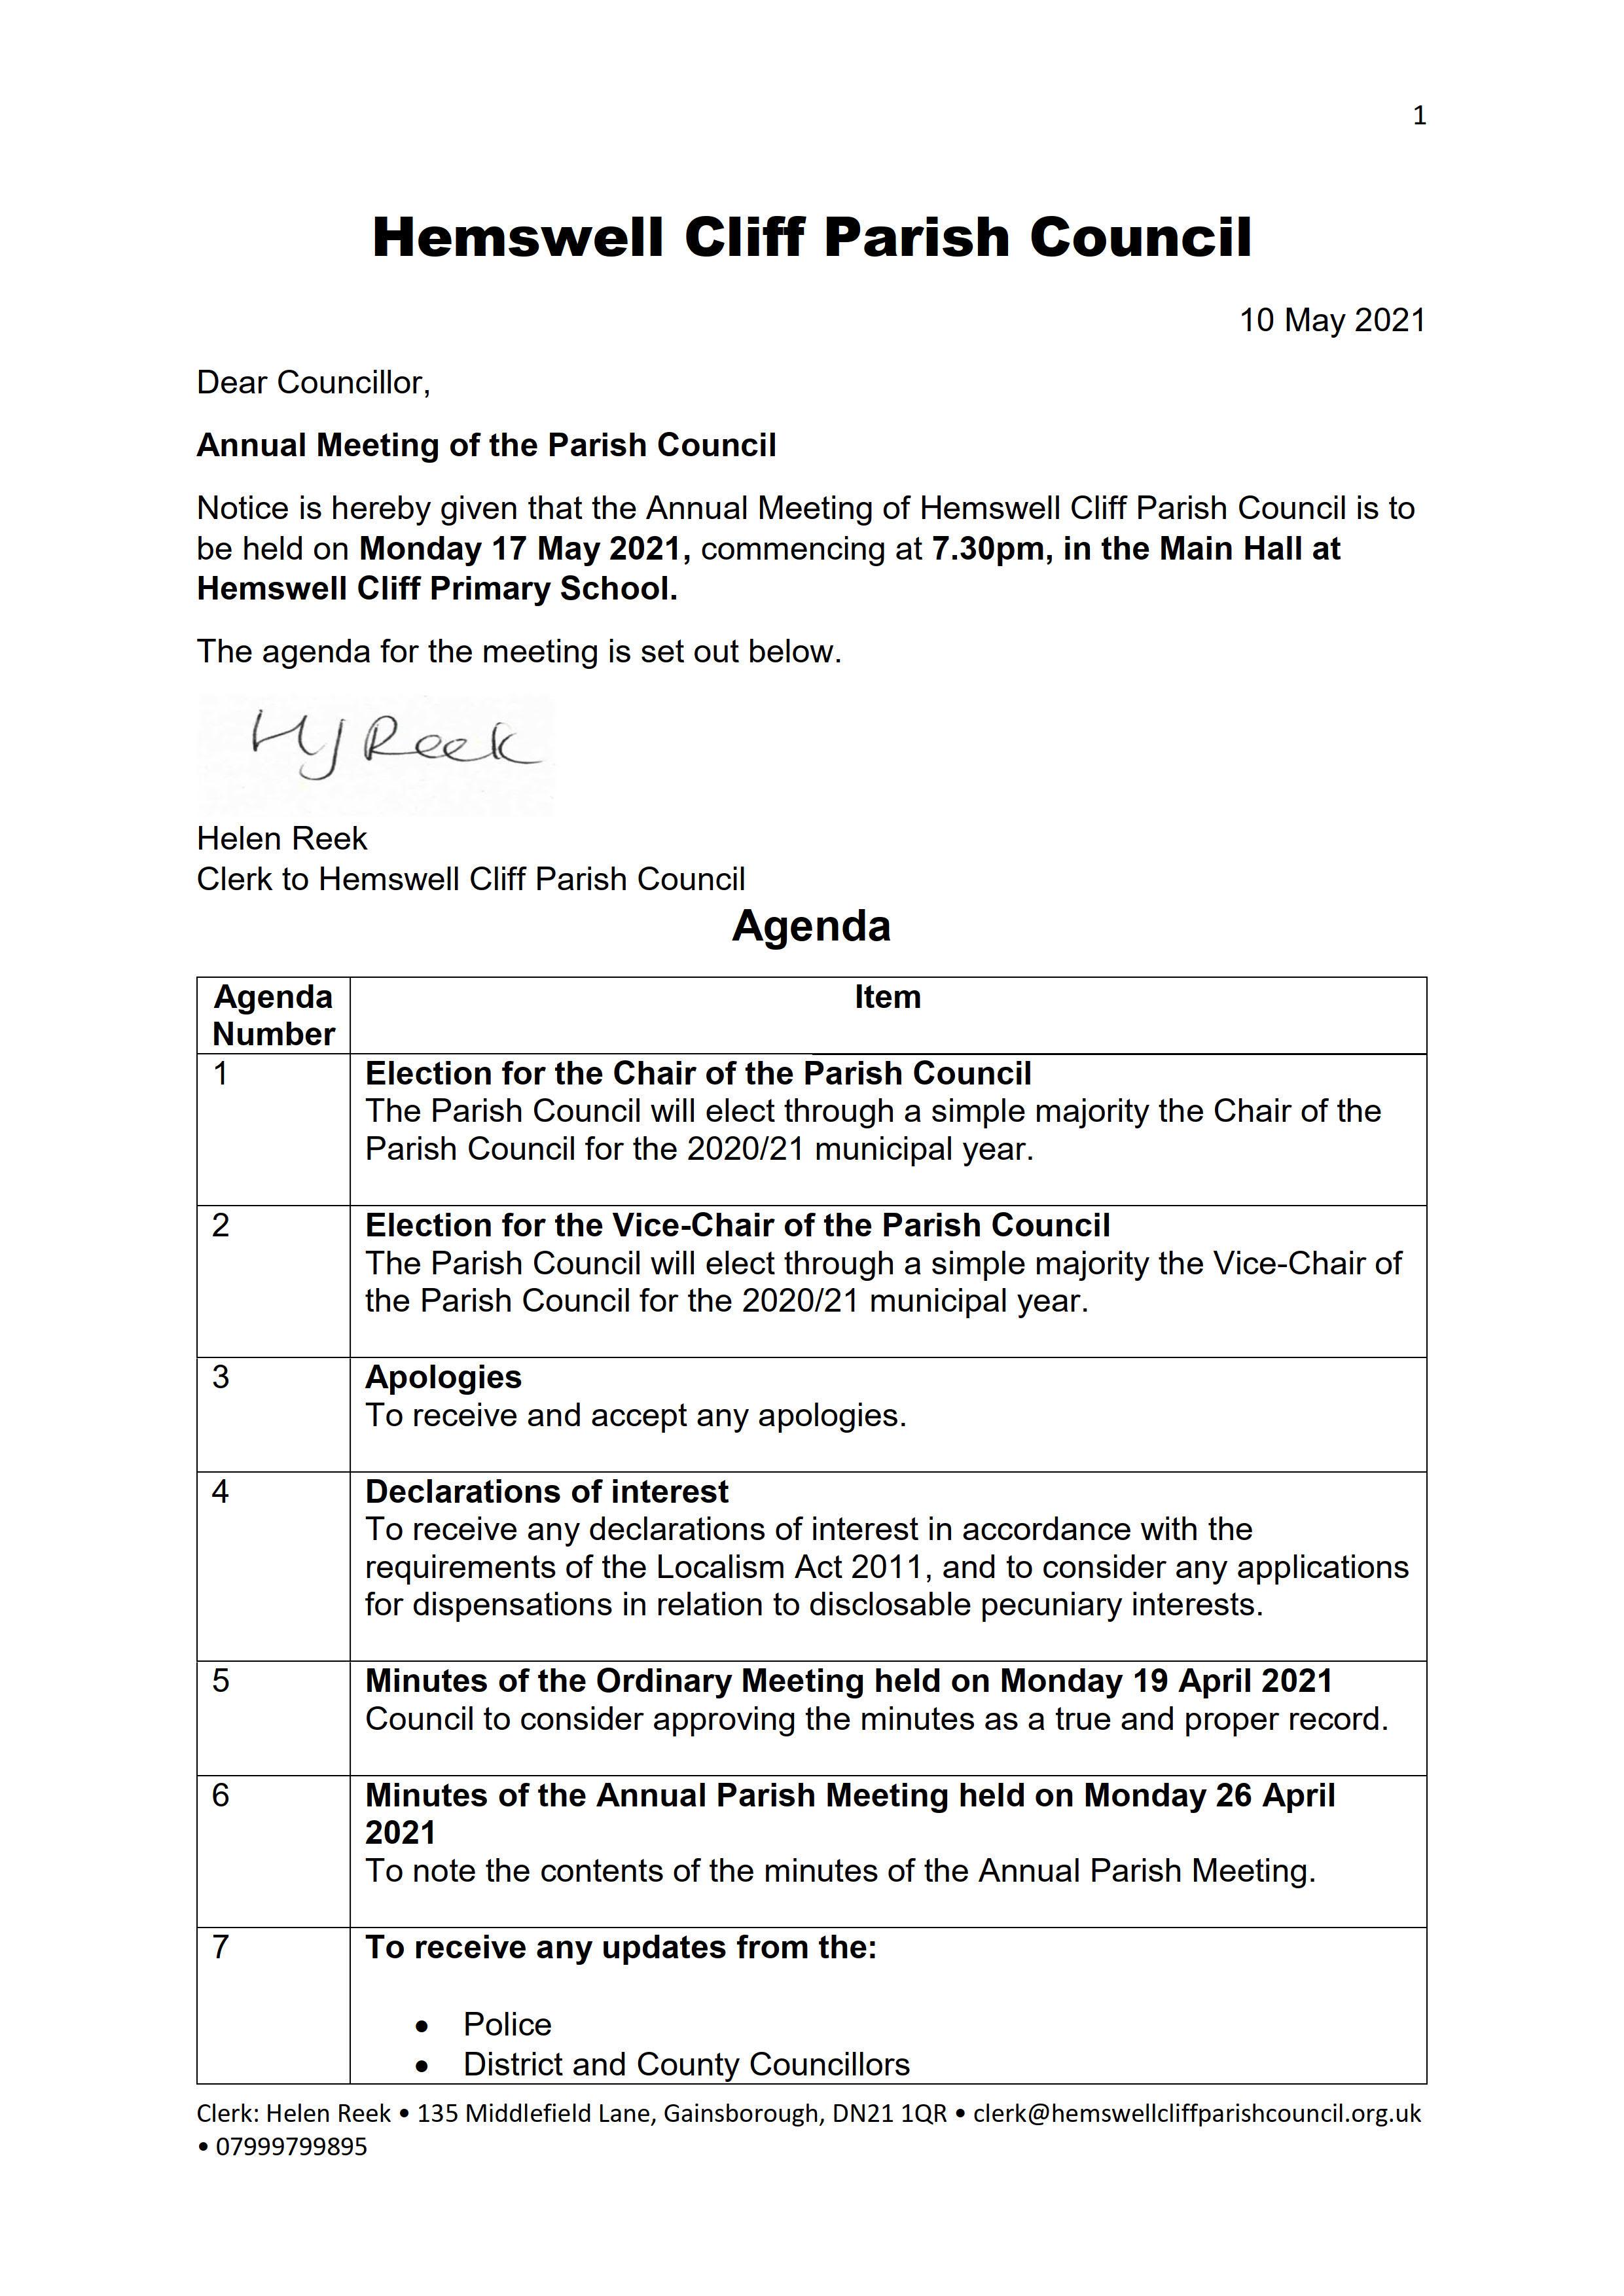 Annual_Meeting_Agenda_17.05.21_1.jpg